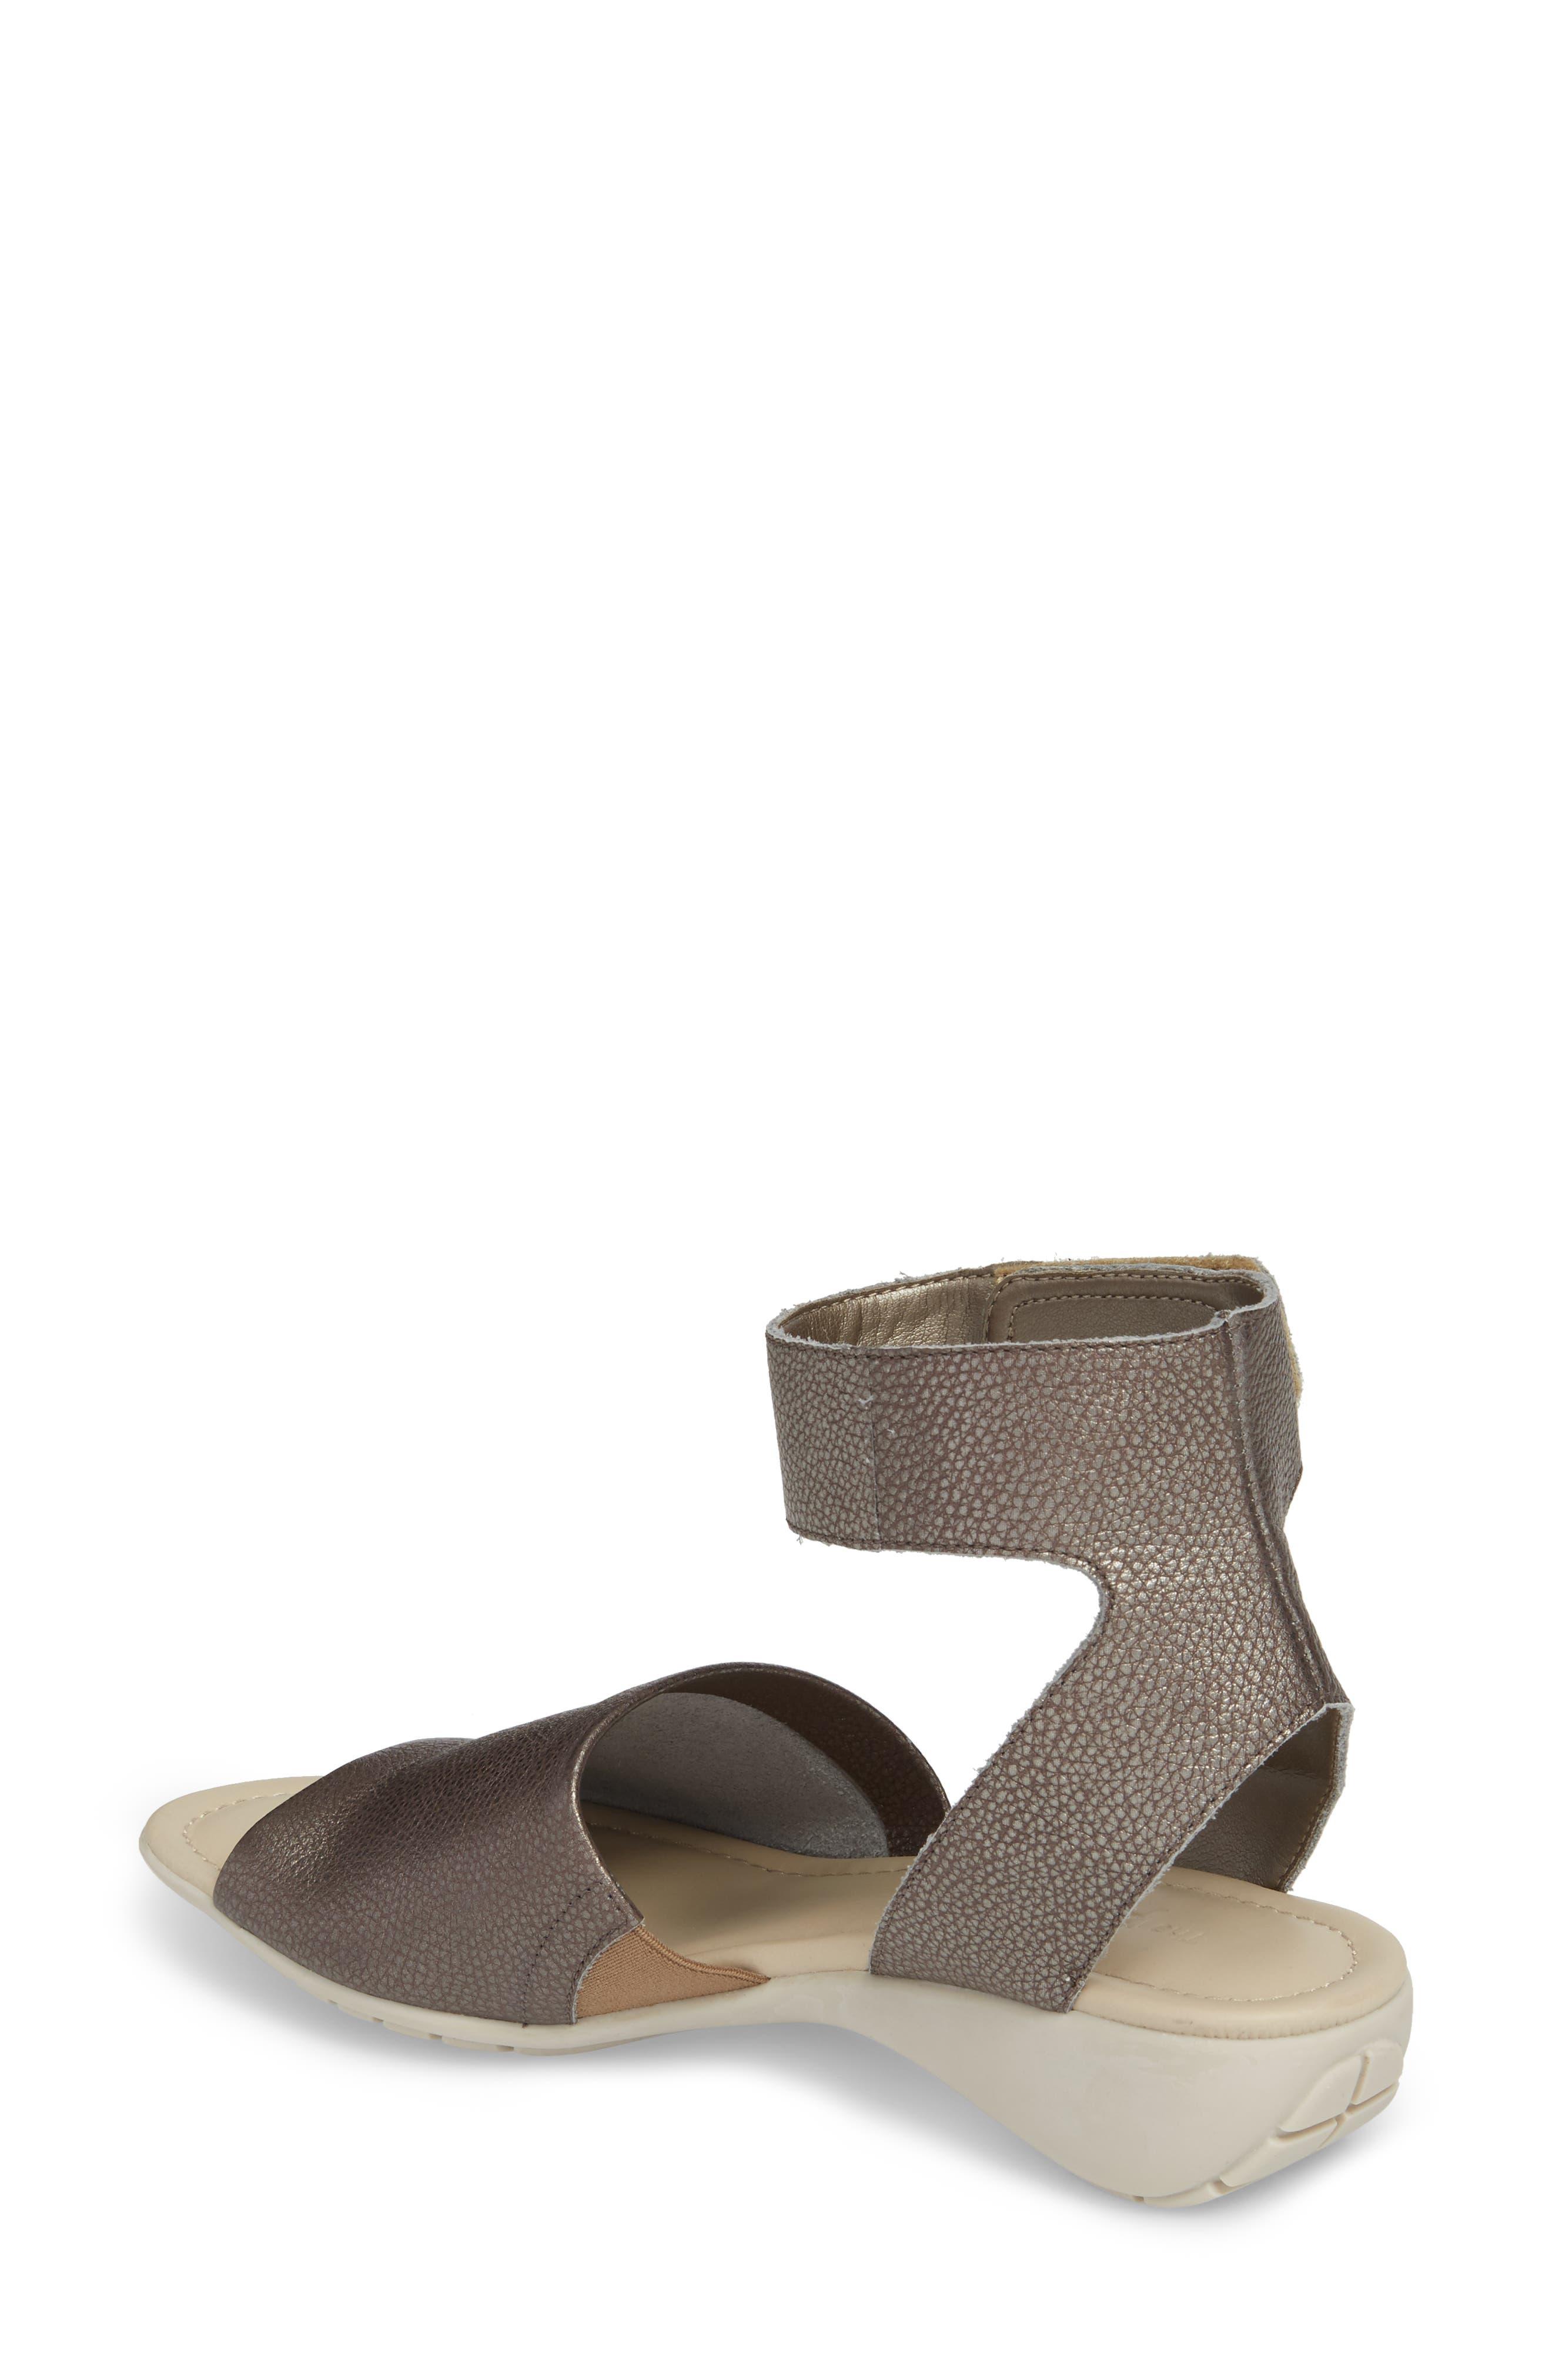 'Beglad' Leather Ankle Strap Sandal,                             Alternate thumbnail 18, color,